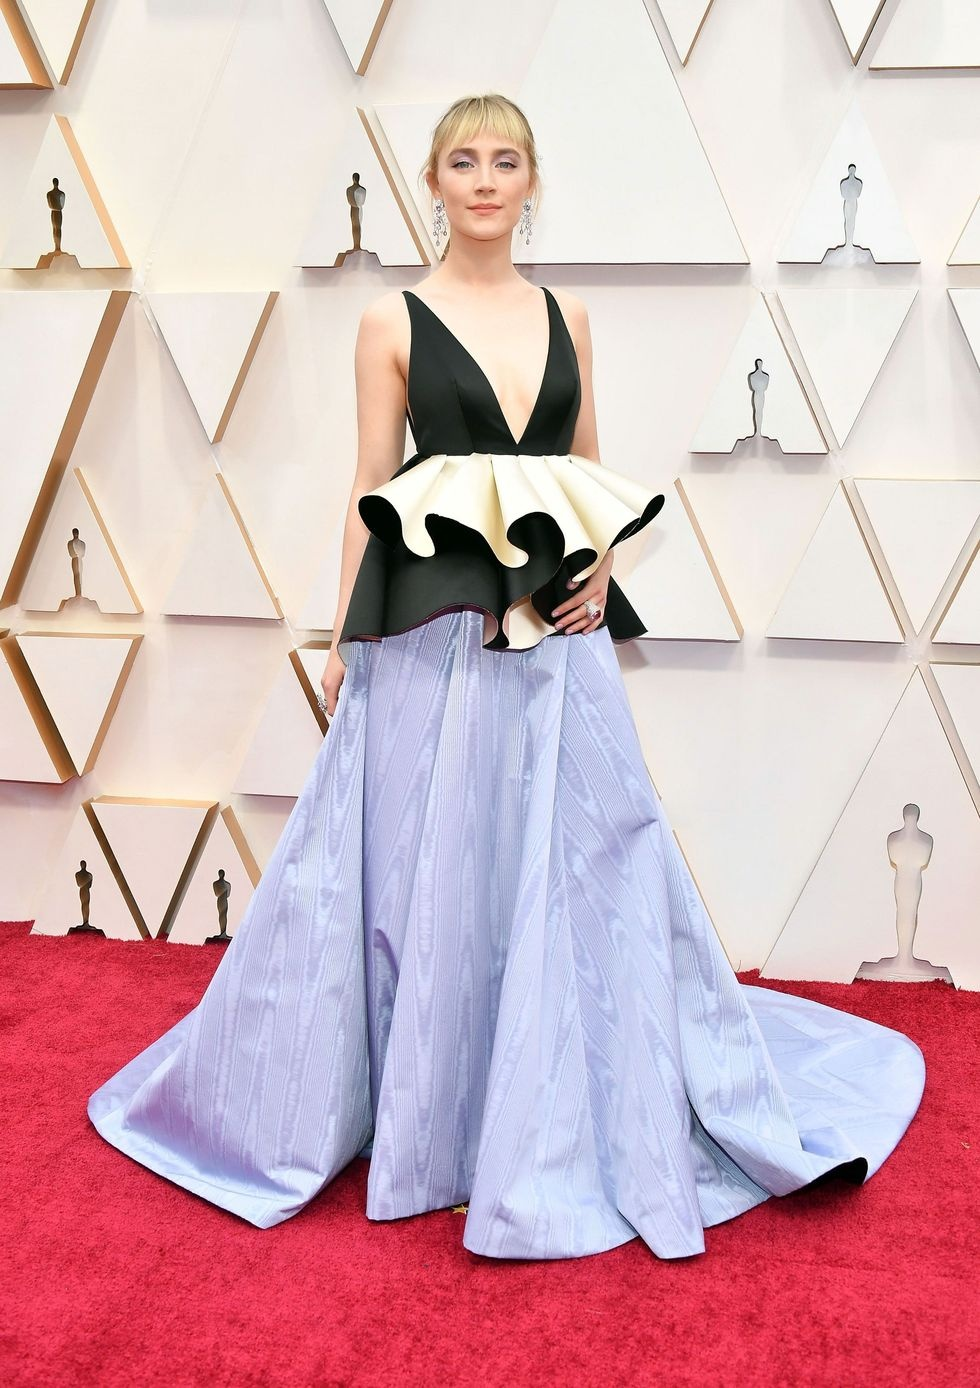 Sao nu mac dep tren tham do Oscar 2020 hinh anh 1 gettyimages_1205139703.jpg